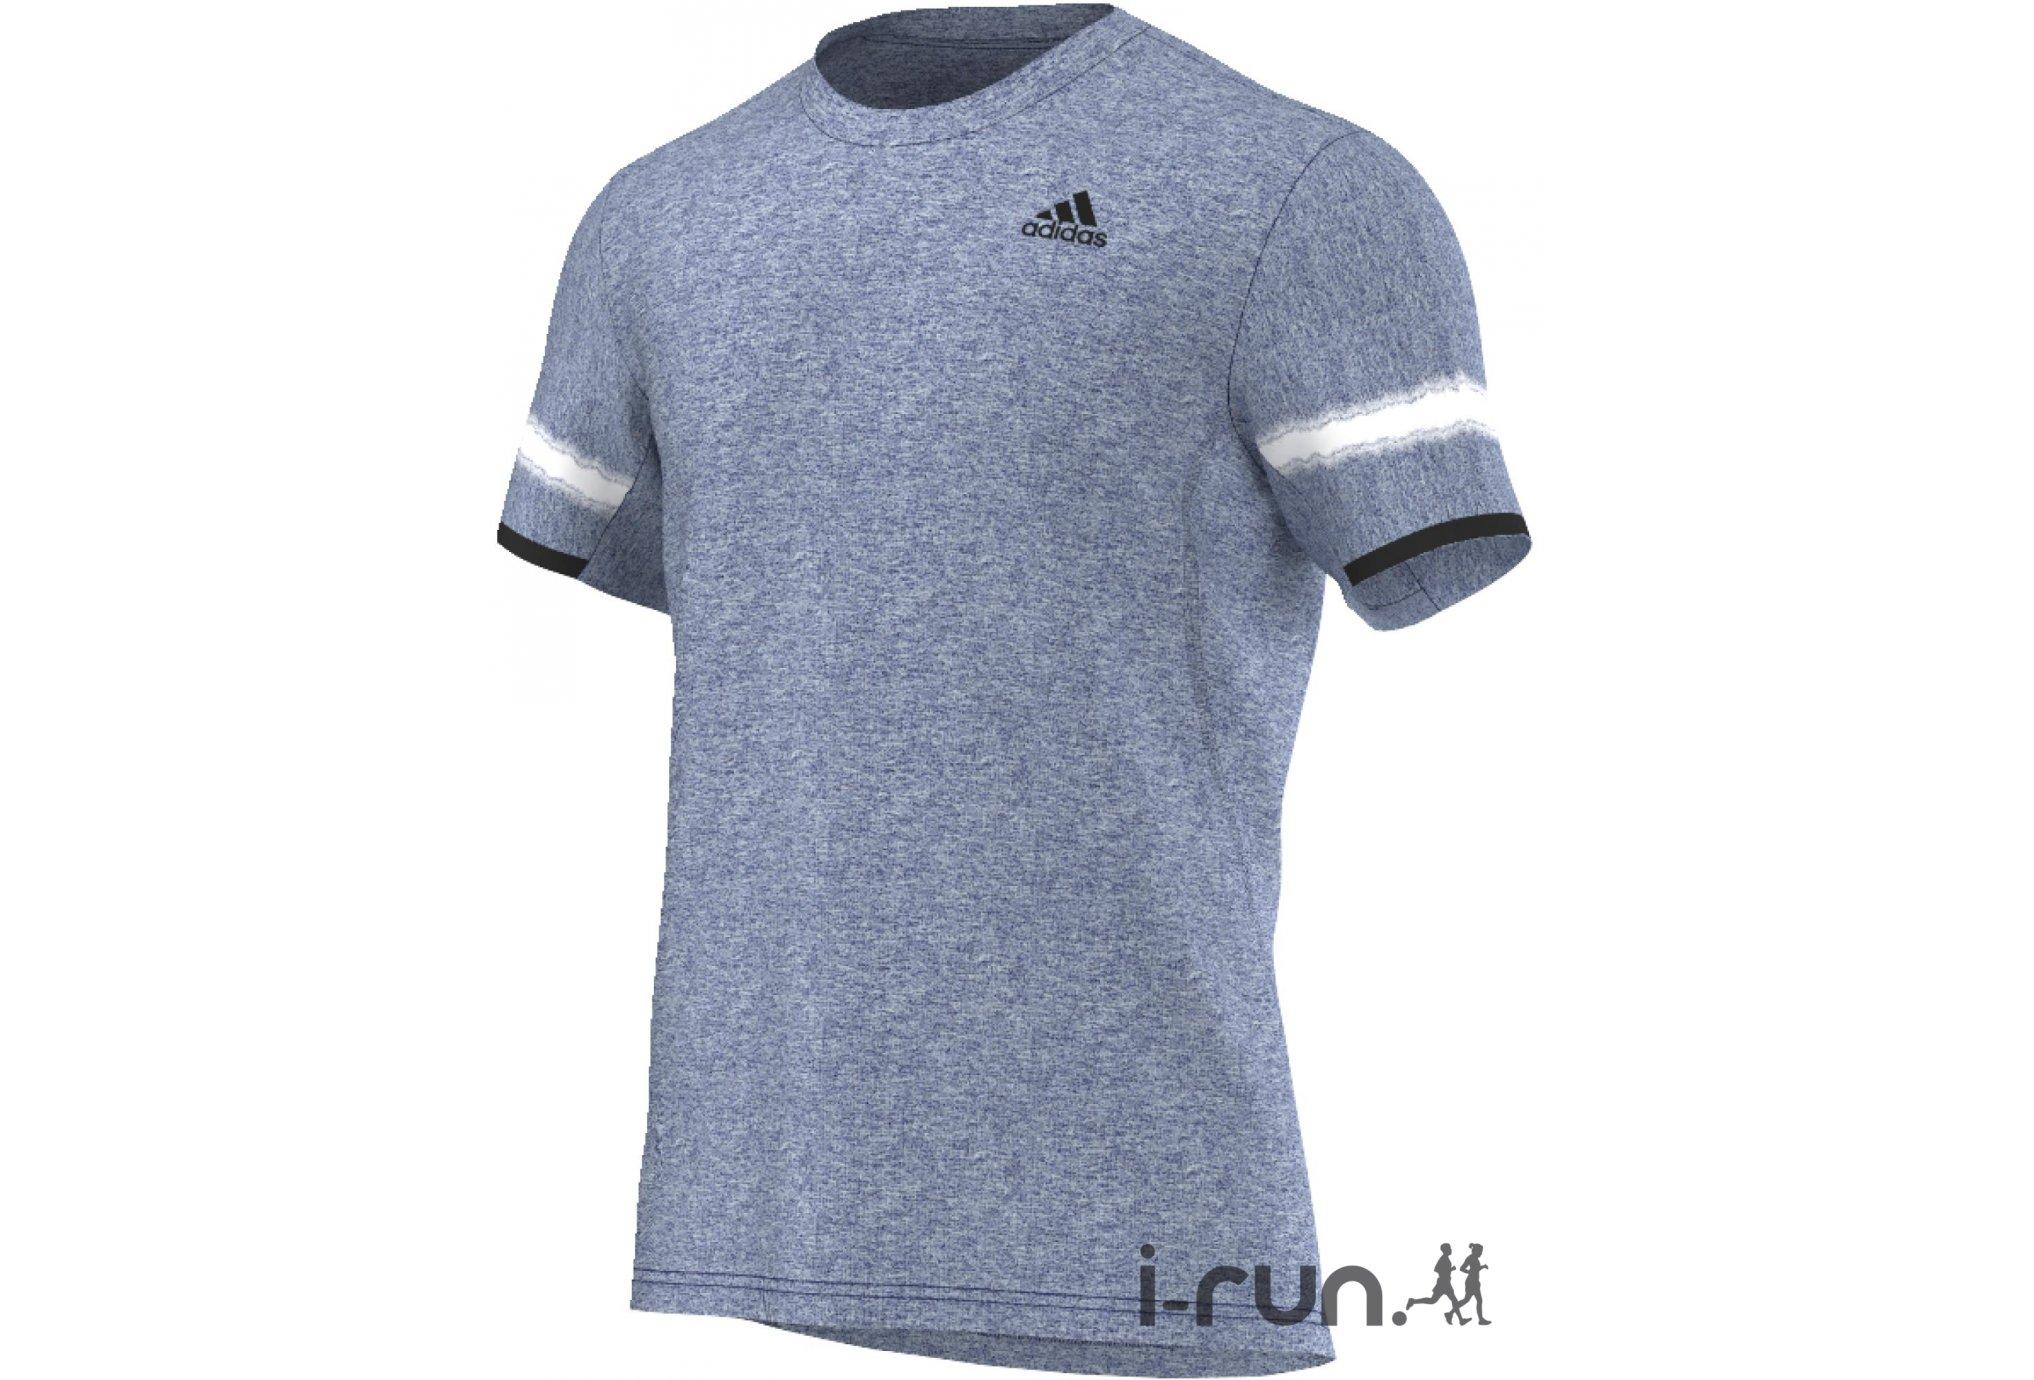 adidas Tee-Shirt Kanoi Premium M vêtement running homme